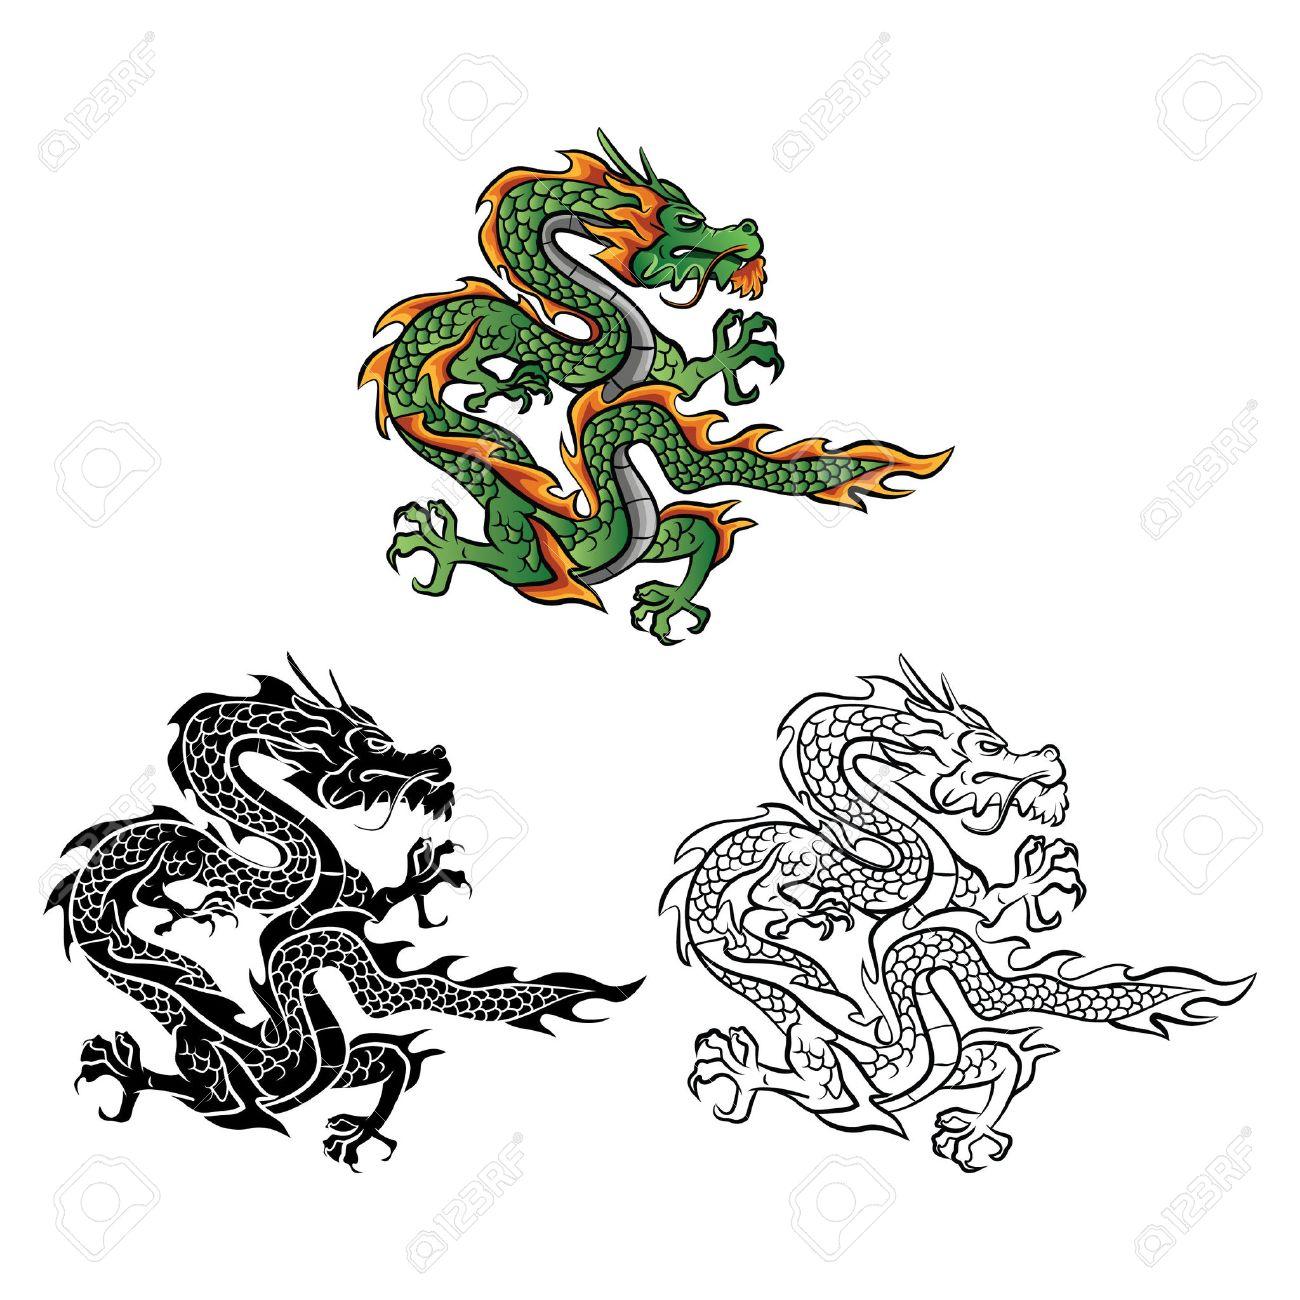 Coloring book Dragon Vector cartoon character - 37577658